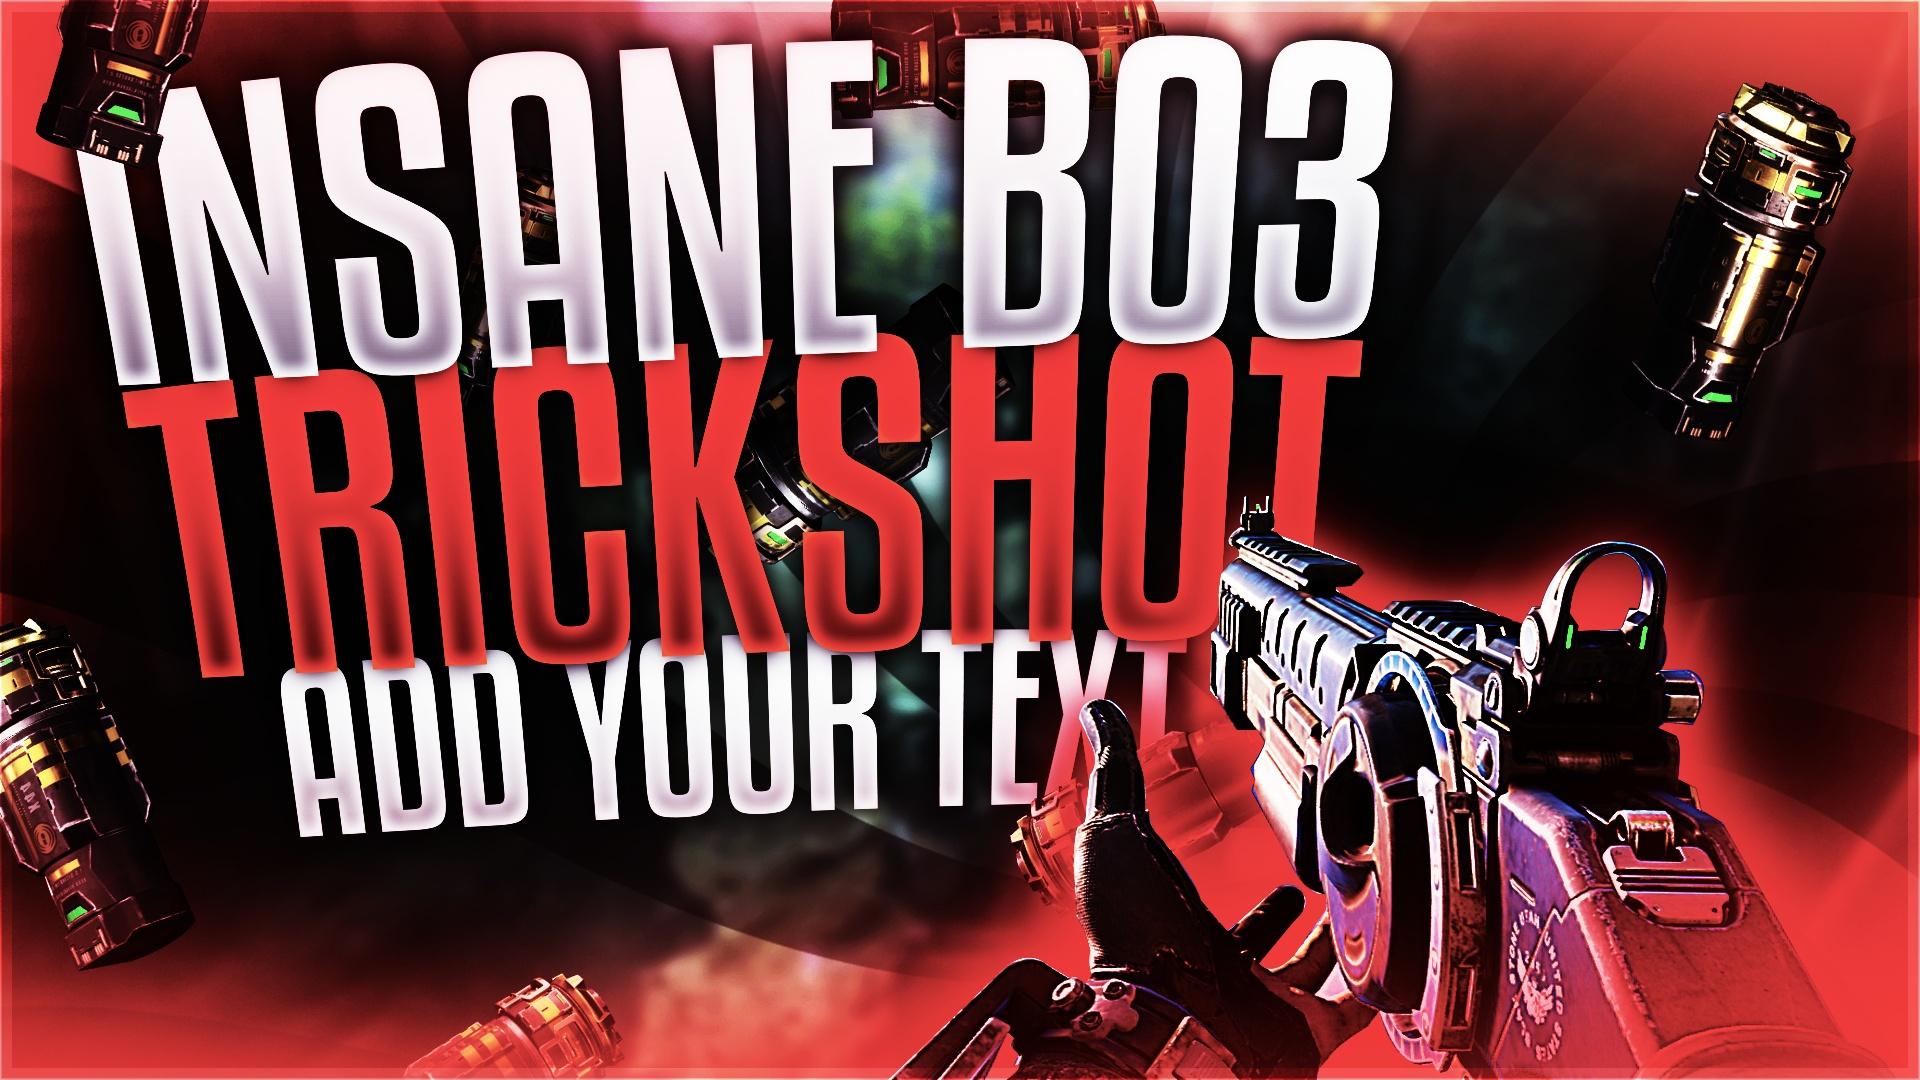 Black Ops 3 Equipment Themed Thumbnail Template v2